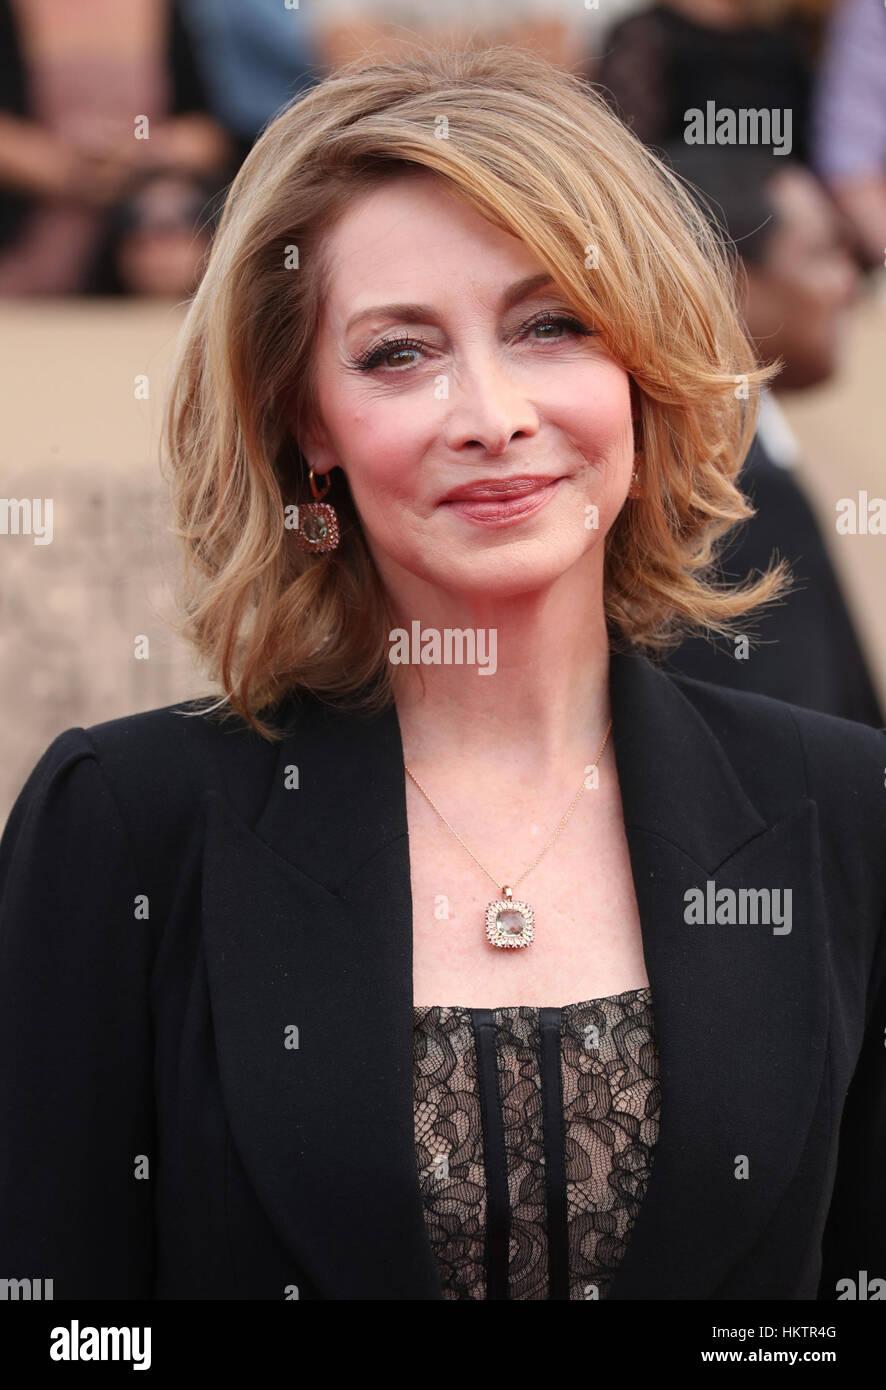 Catherine McCormack (born 1972),Stefanie Scott Hot archive Jan Hooks born April 23, 1957,Virginia Pearson